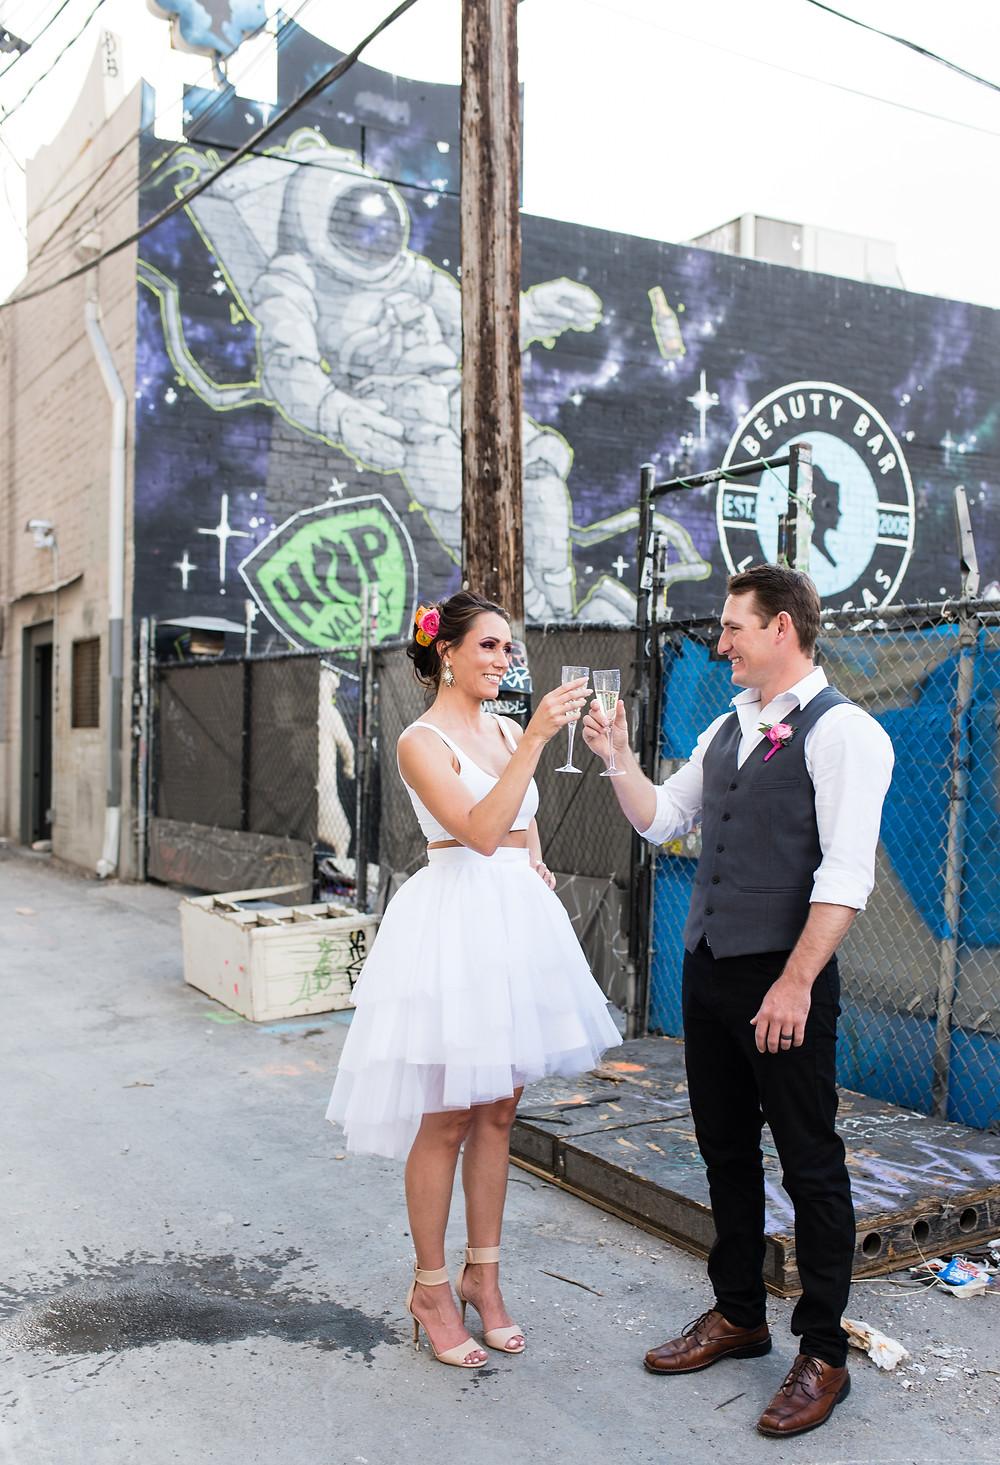 vegas bride, vegas groom, downtown las vegas, las vegas wedding, we eloped, elopement inspo, destionation elopement, vegas wedding, vegas wedding photographer, super fun vegas elopement